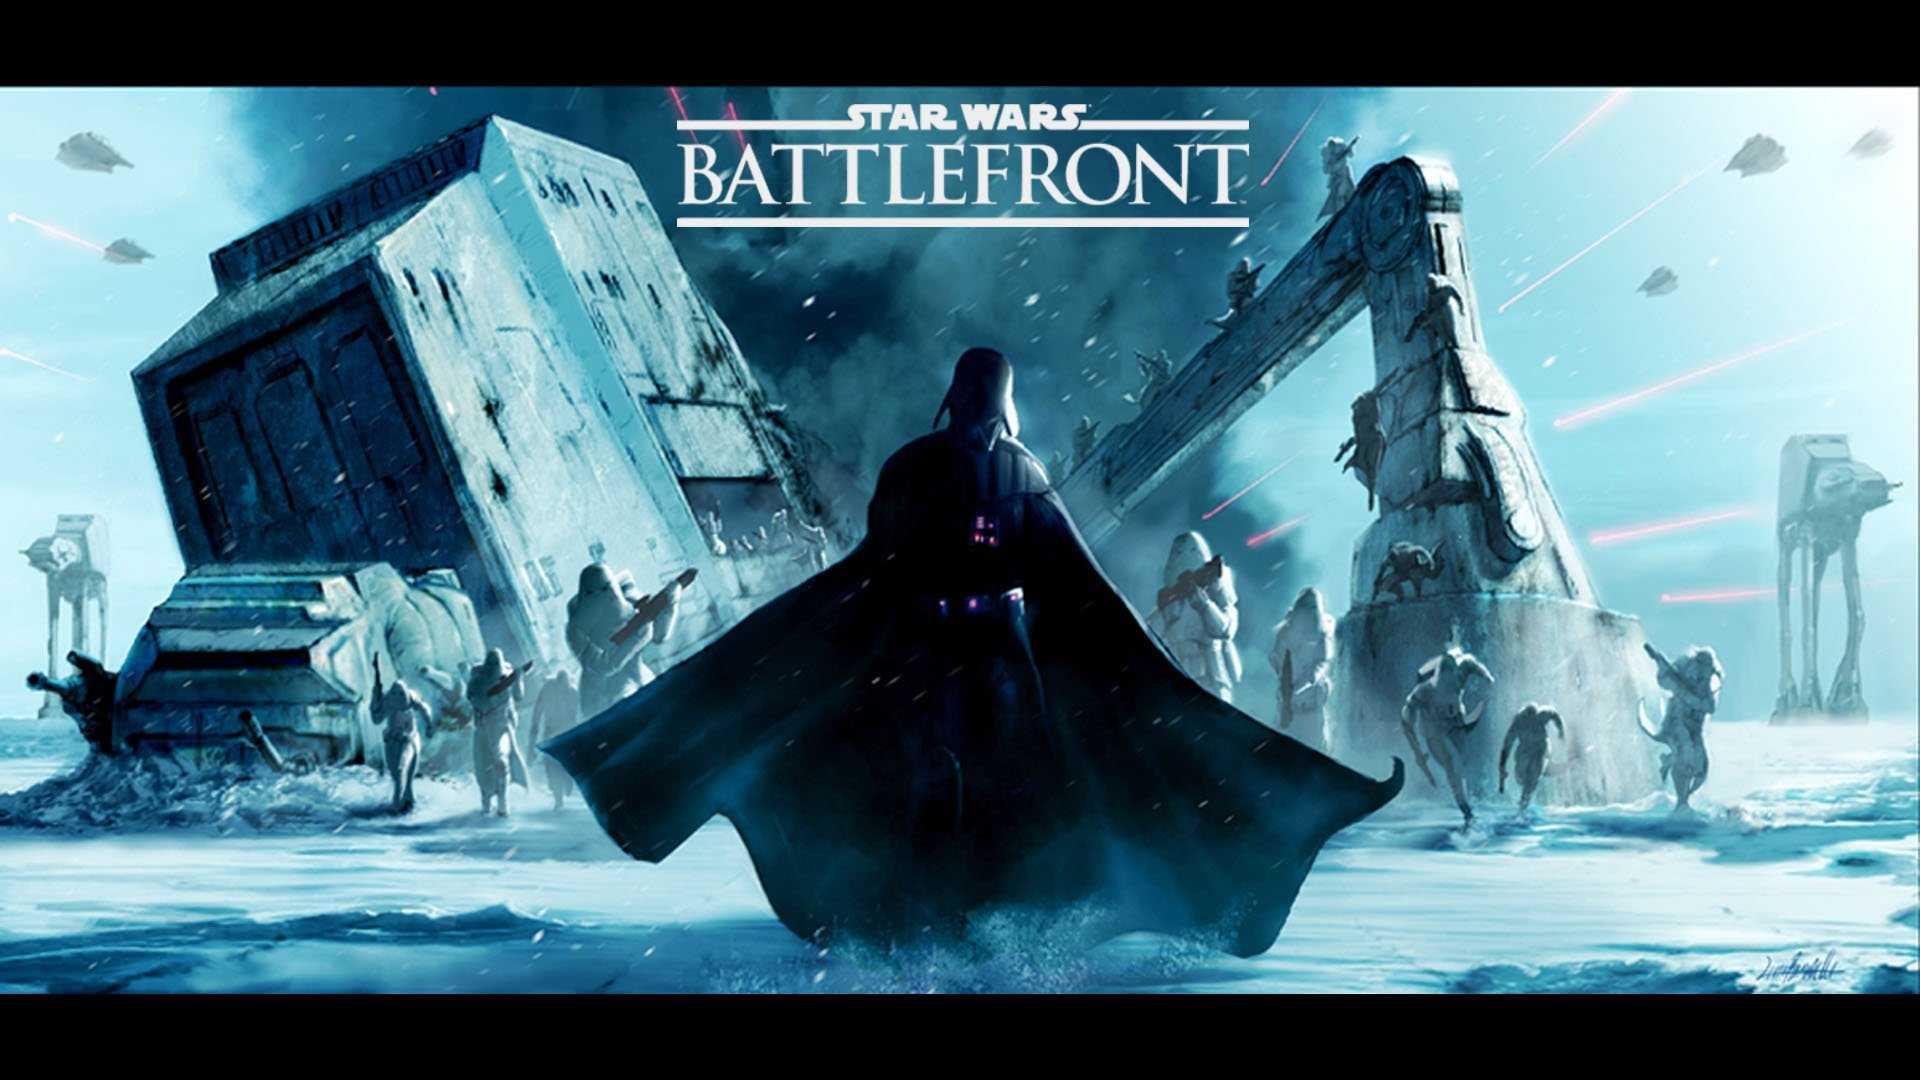 Star Wars Battlefront Wallpapers Top Free Star Wars Battlefront